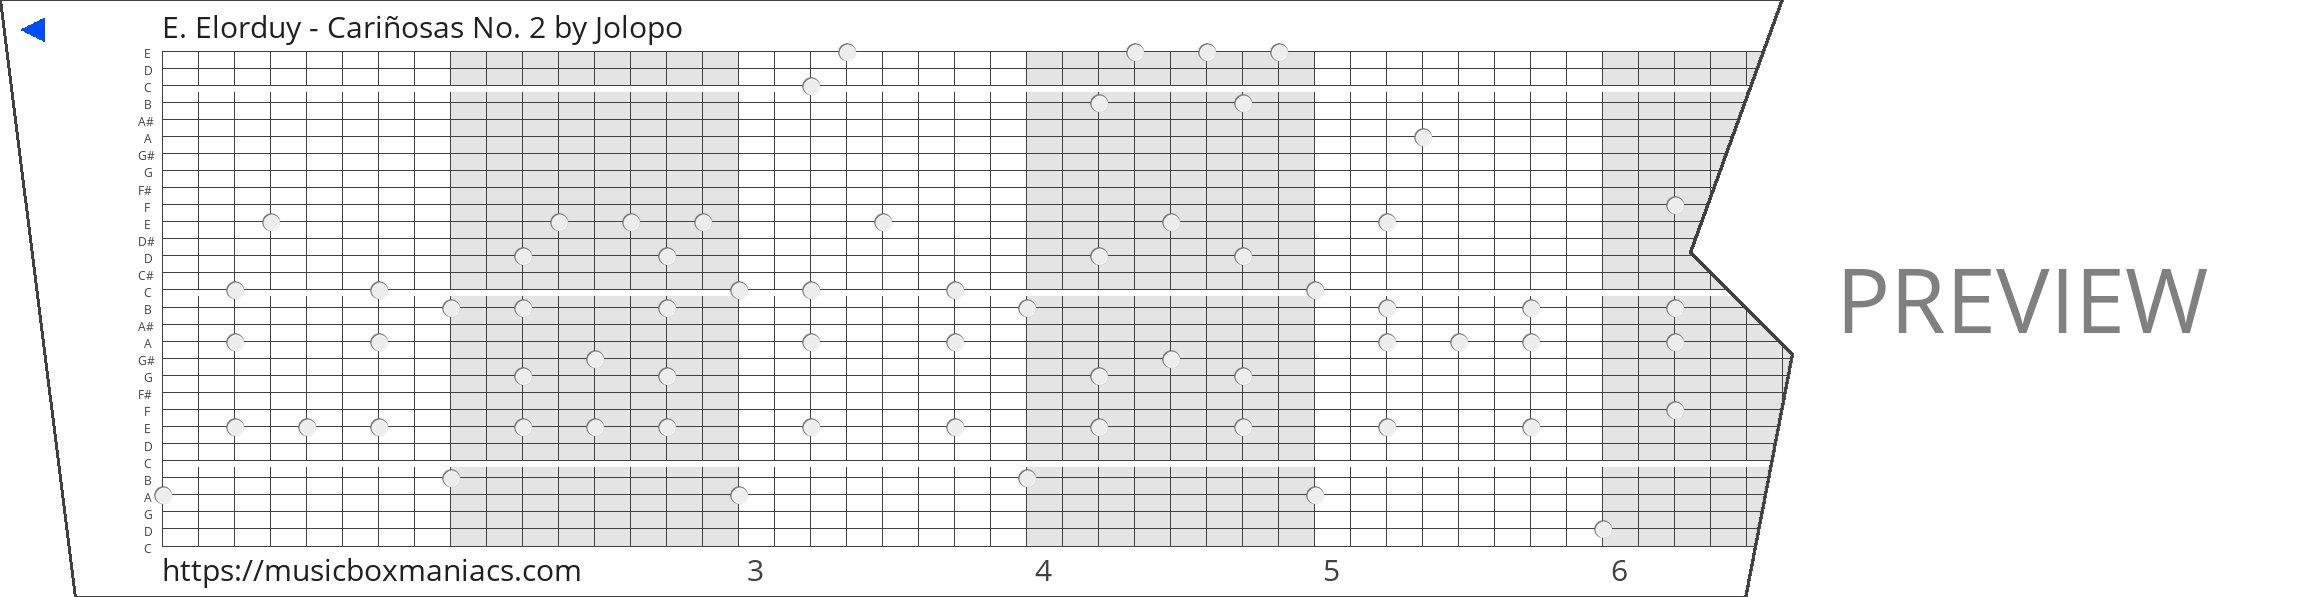 E. Elorduy - Cariñosas No. 2 30 note music box paper strip